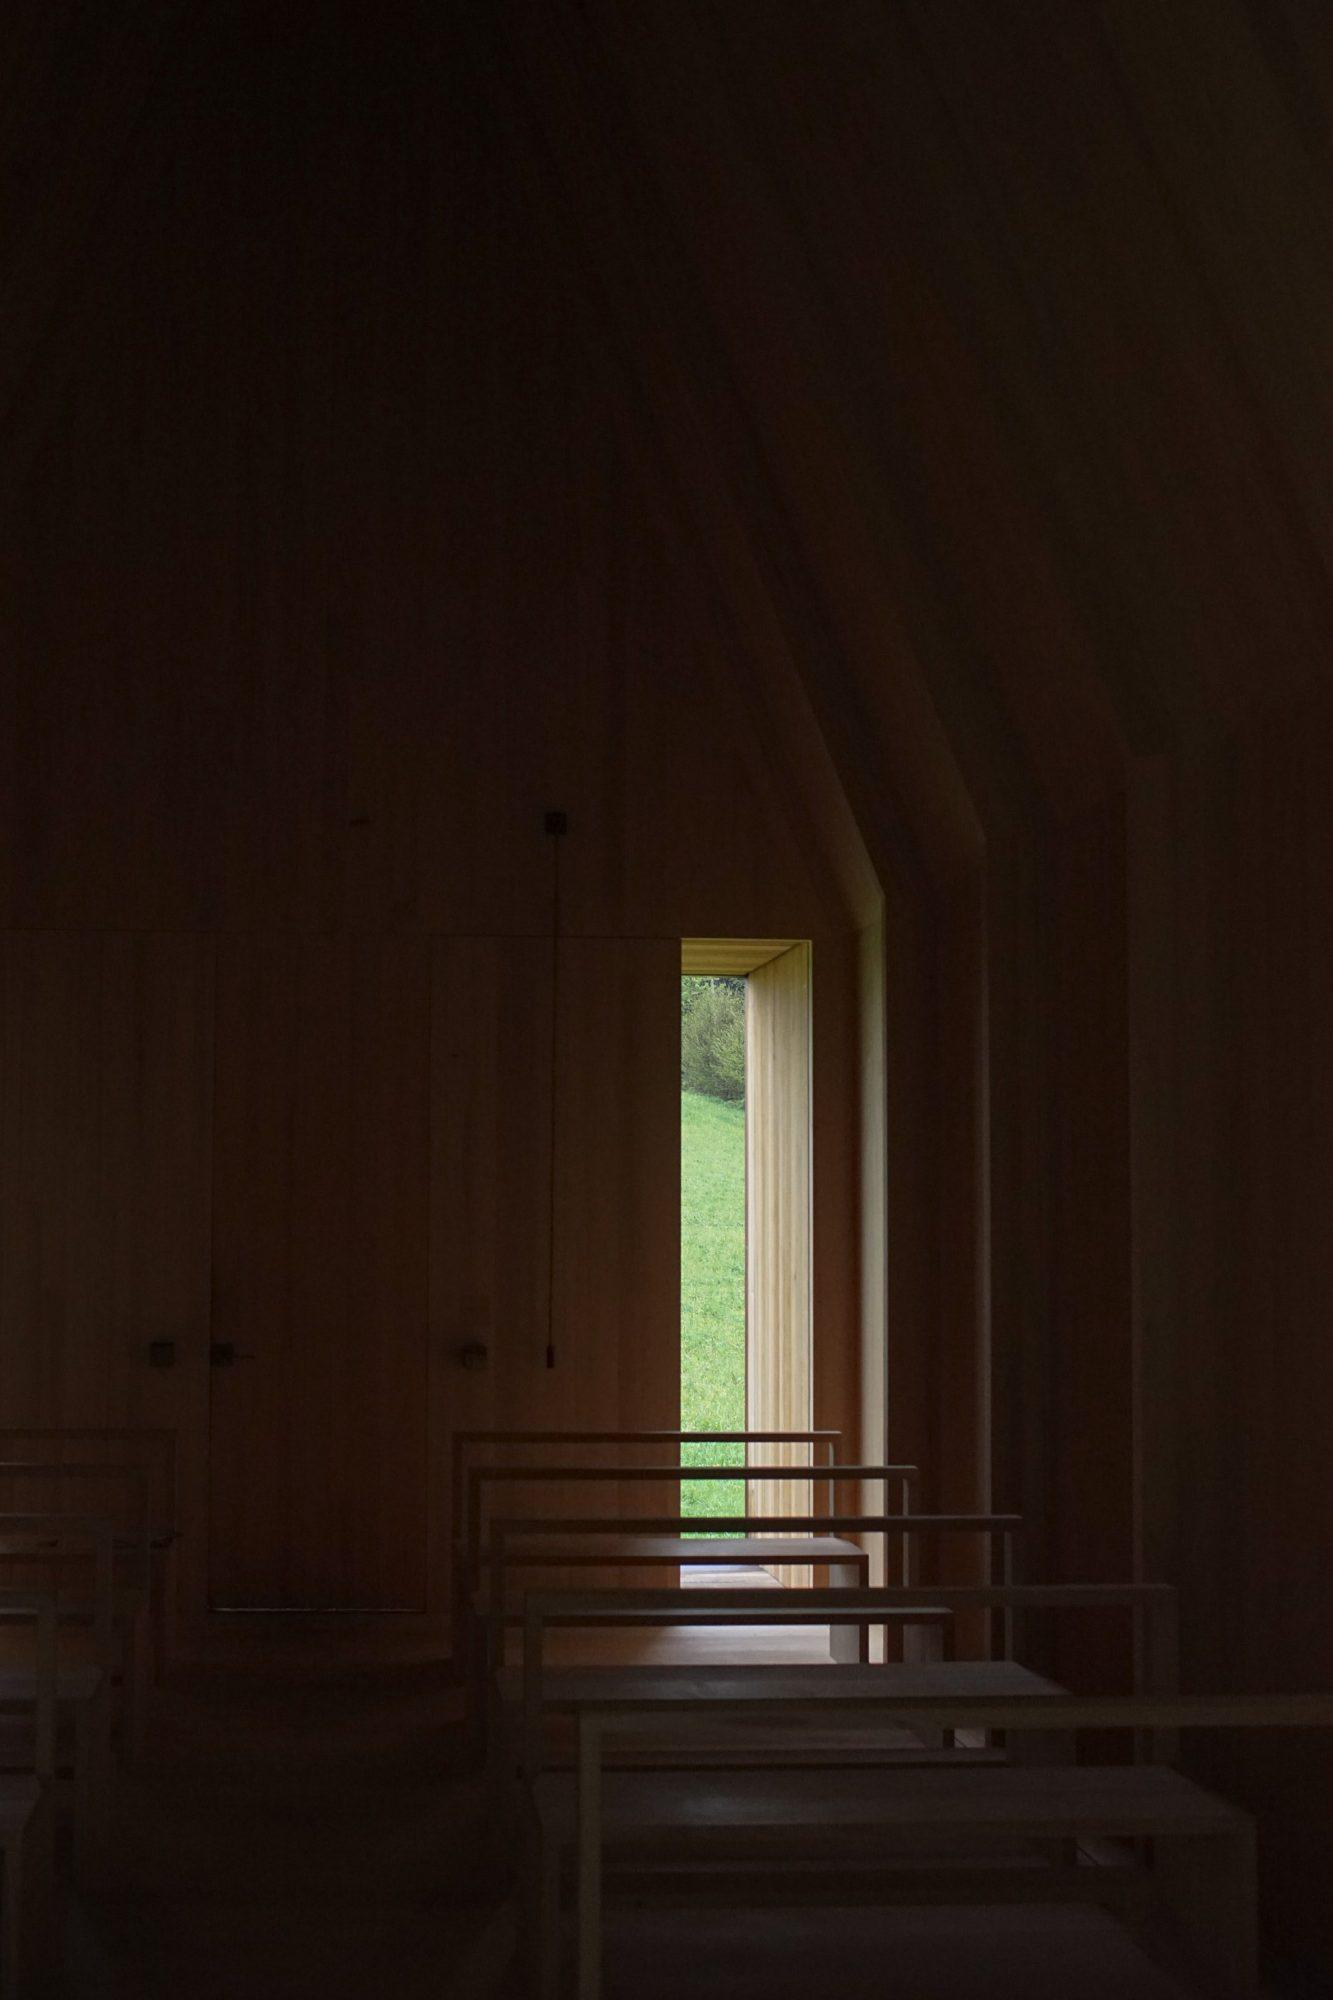 salgenreute-chapel-bernardo-bader-photo-jean-nicolas-lechat-urbantyper-ombre